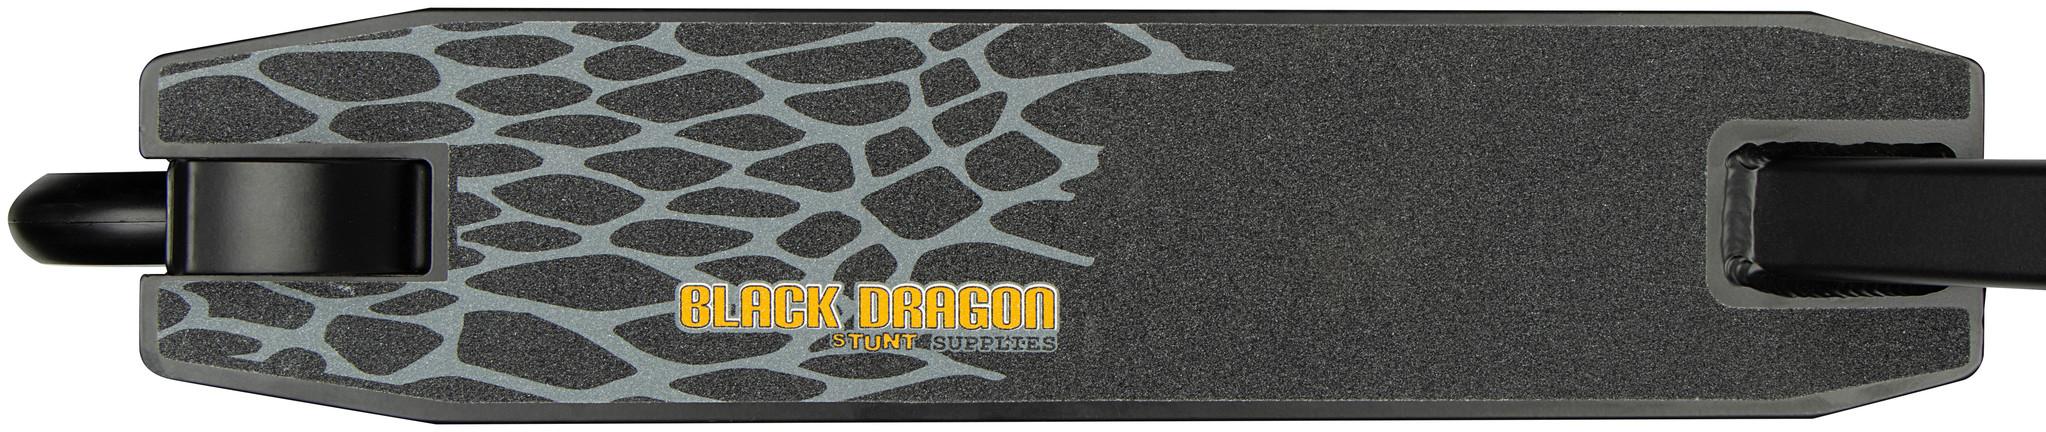 BLACK DRAGON BLACK DRAGON STUNTSTEP, GILDED TARRAGON